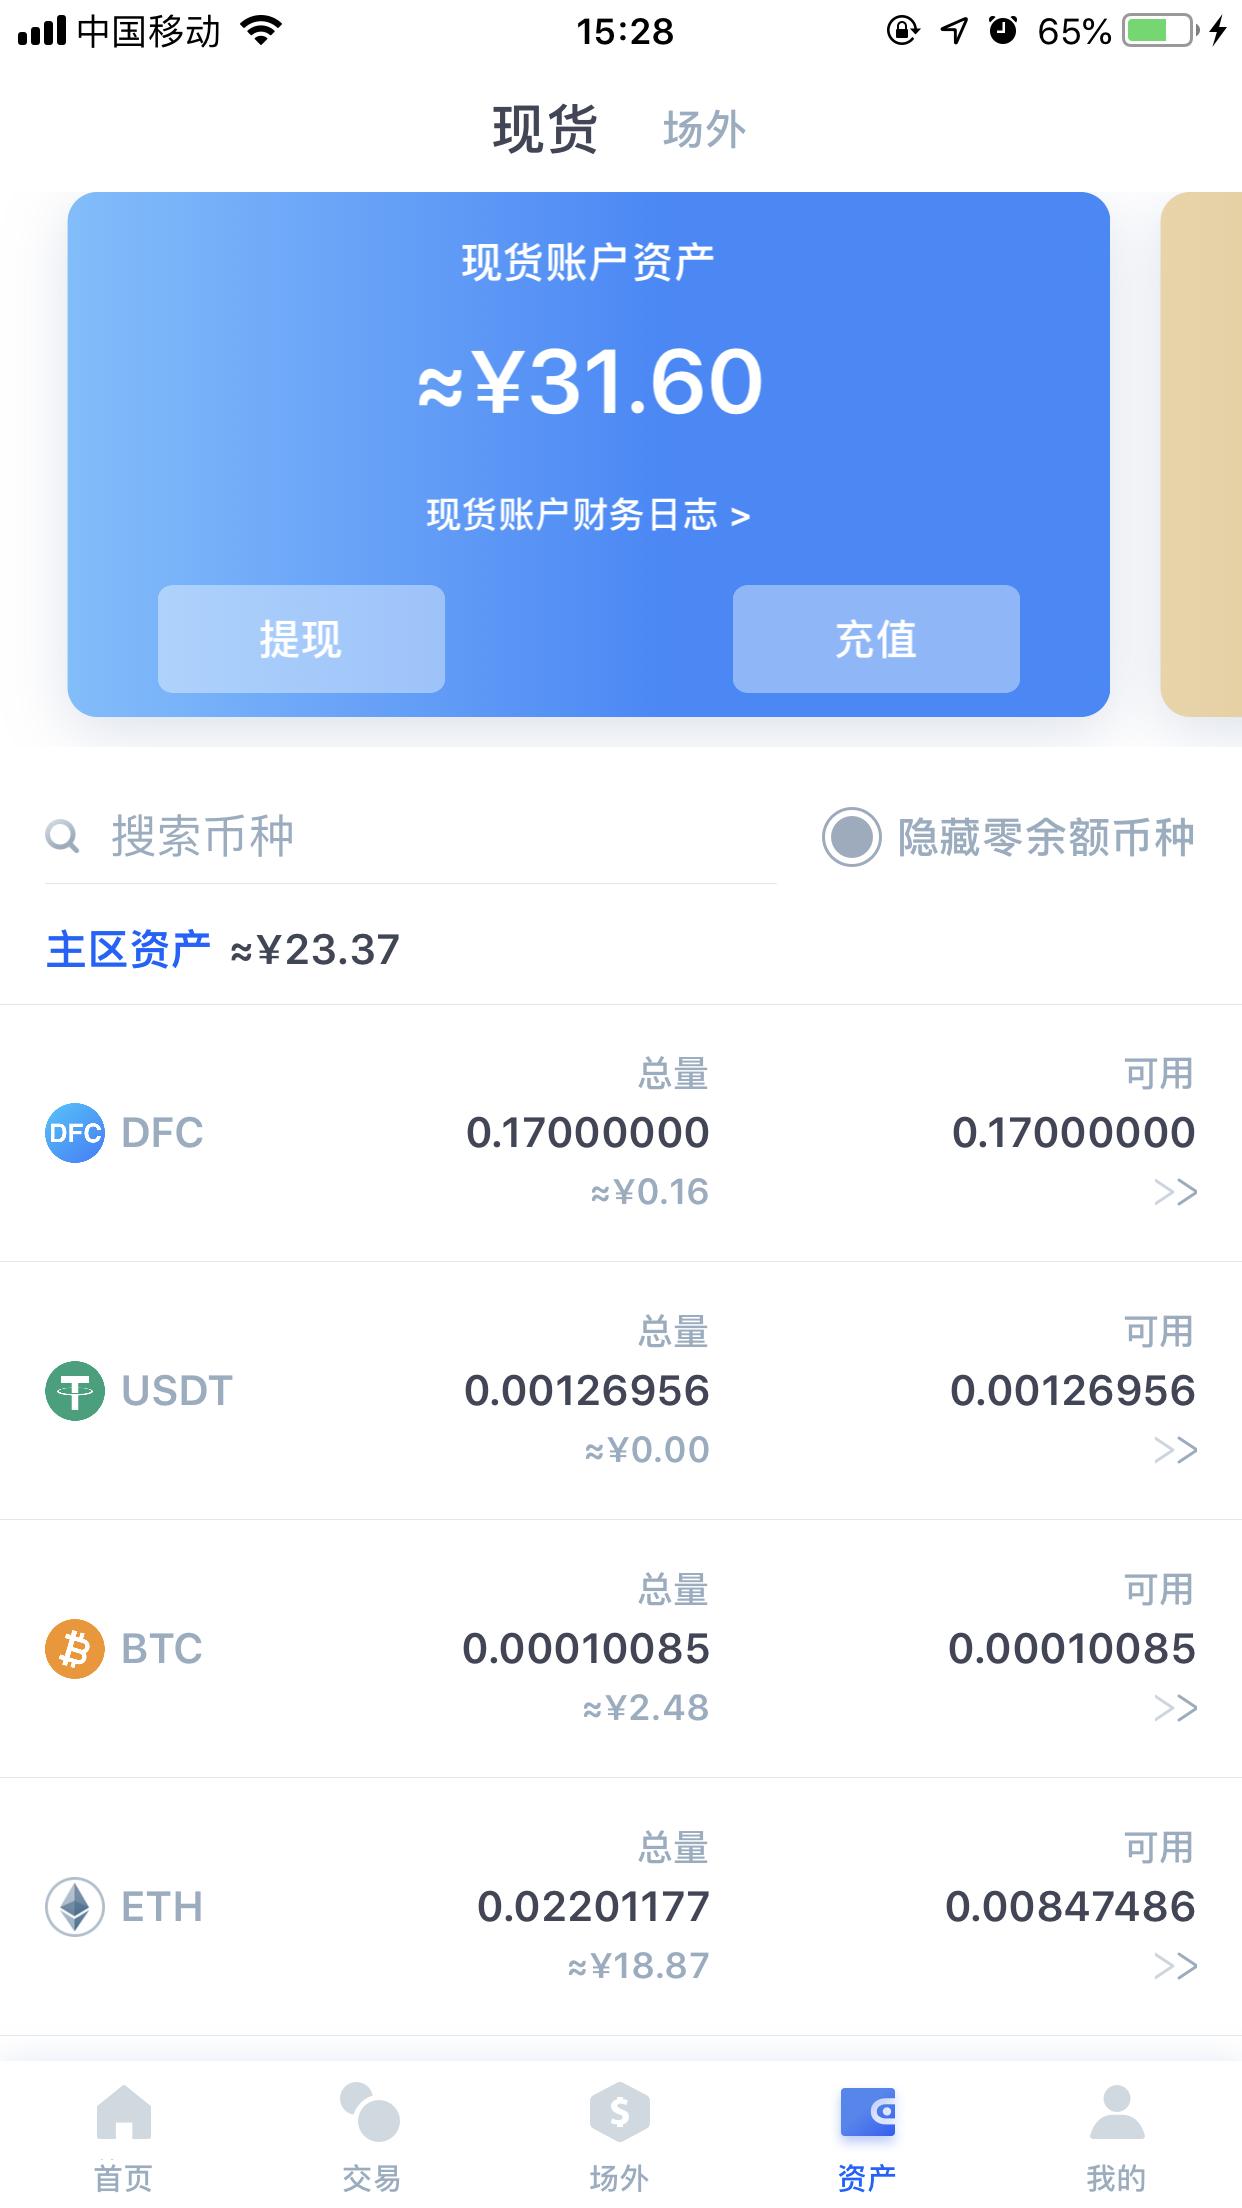 https://digifinex.zendesk.com/hc/zh-cn/article_attachments/360022017194/1aa44a7b91739bb5d630e827511ef15e6eab72114be1031d2ffd8efd6180ceba.png